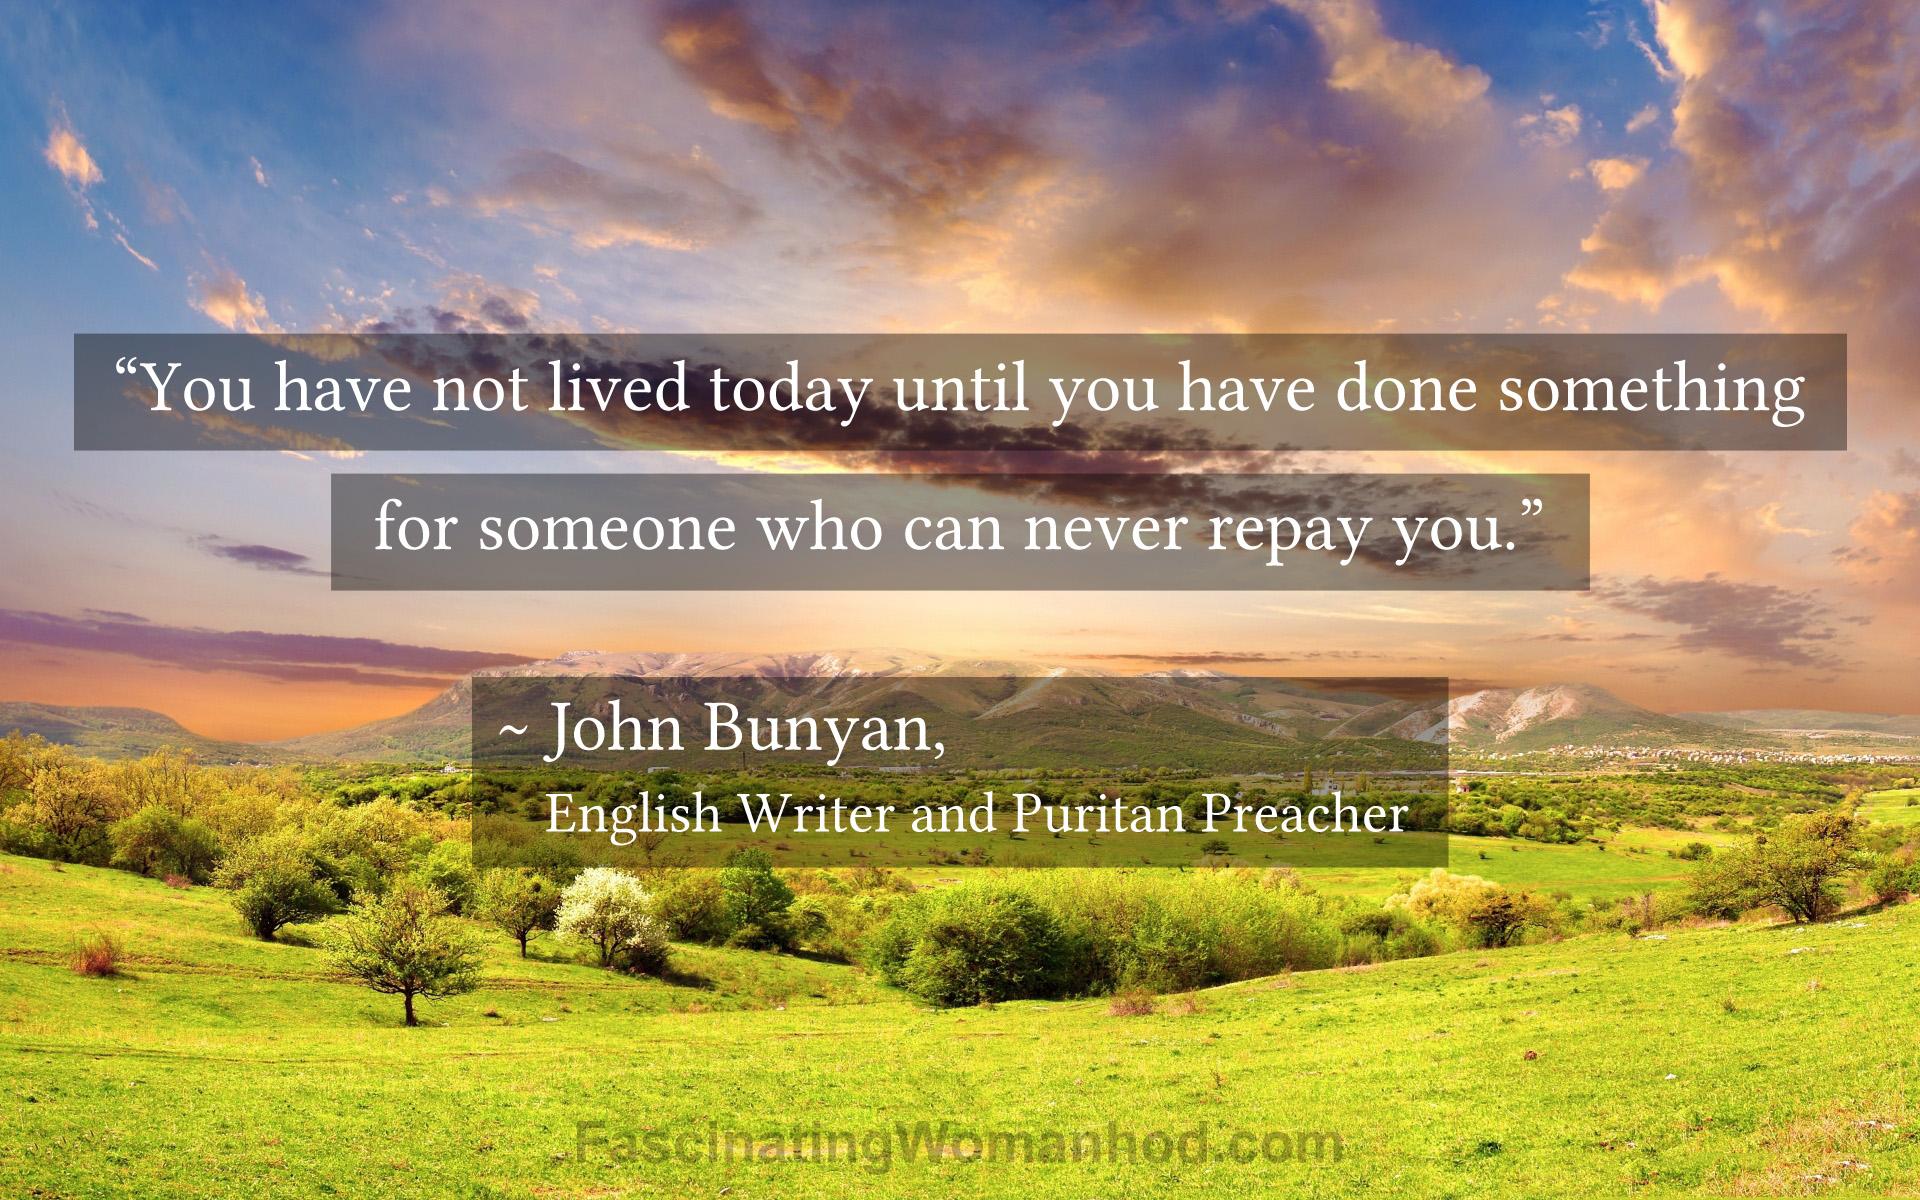 A Quote by John Bunyan.jpg